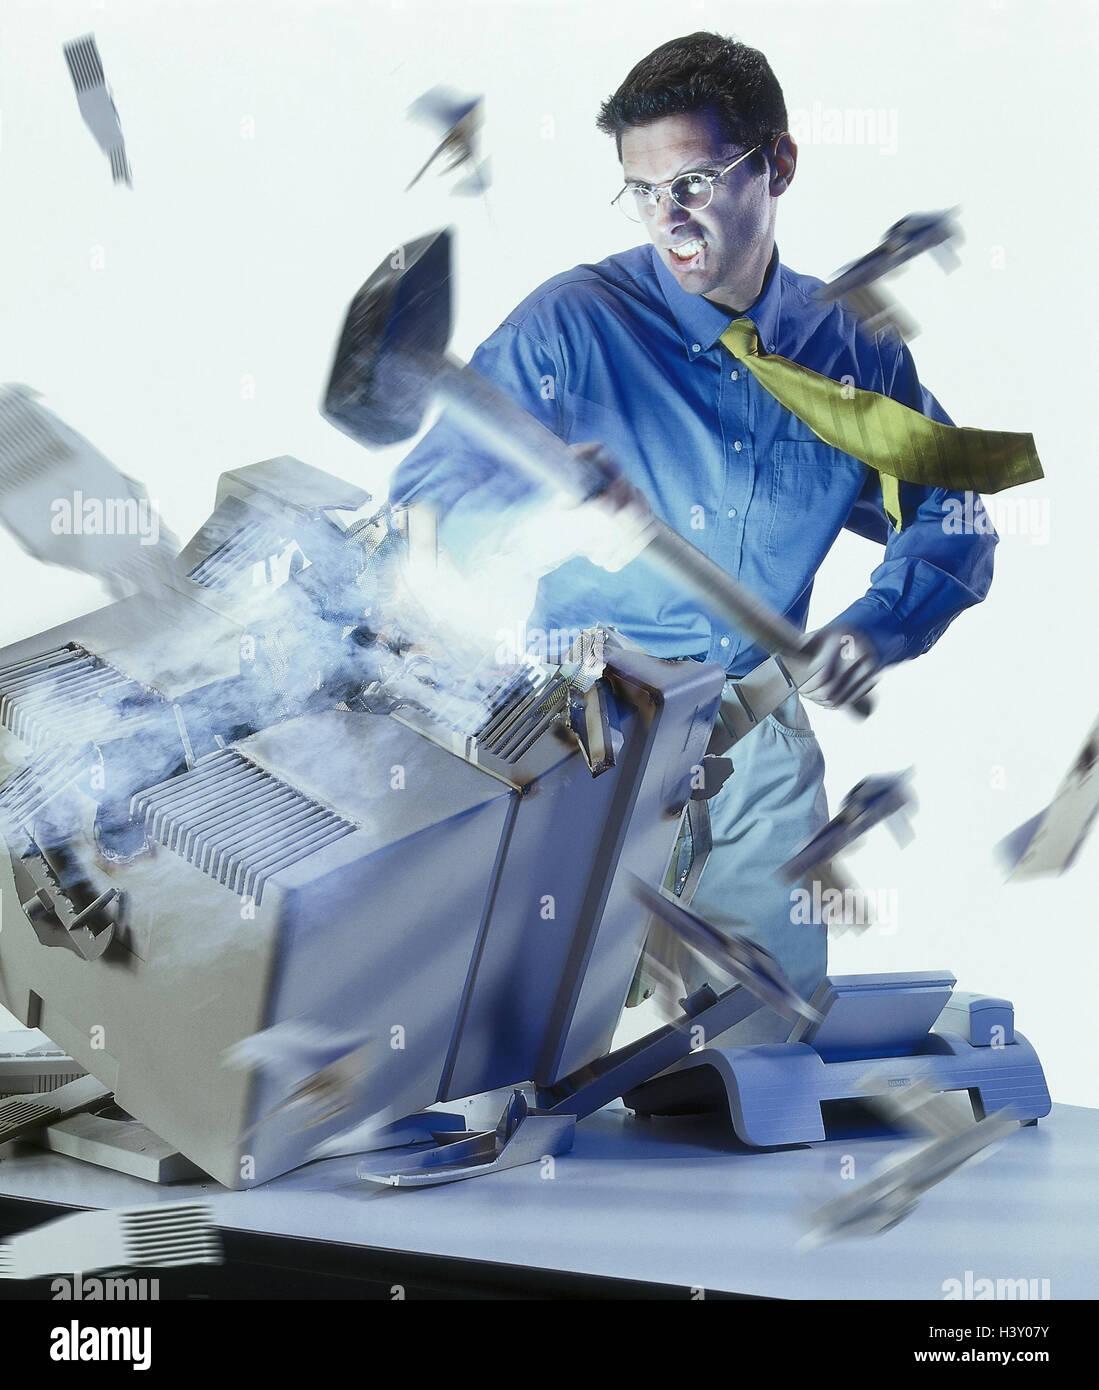 Man, computers, sledgehammer, destruction, icon, computer crash, [M], power, crash, system, system fault, virus, Stock Photo